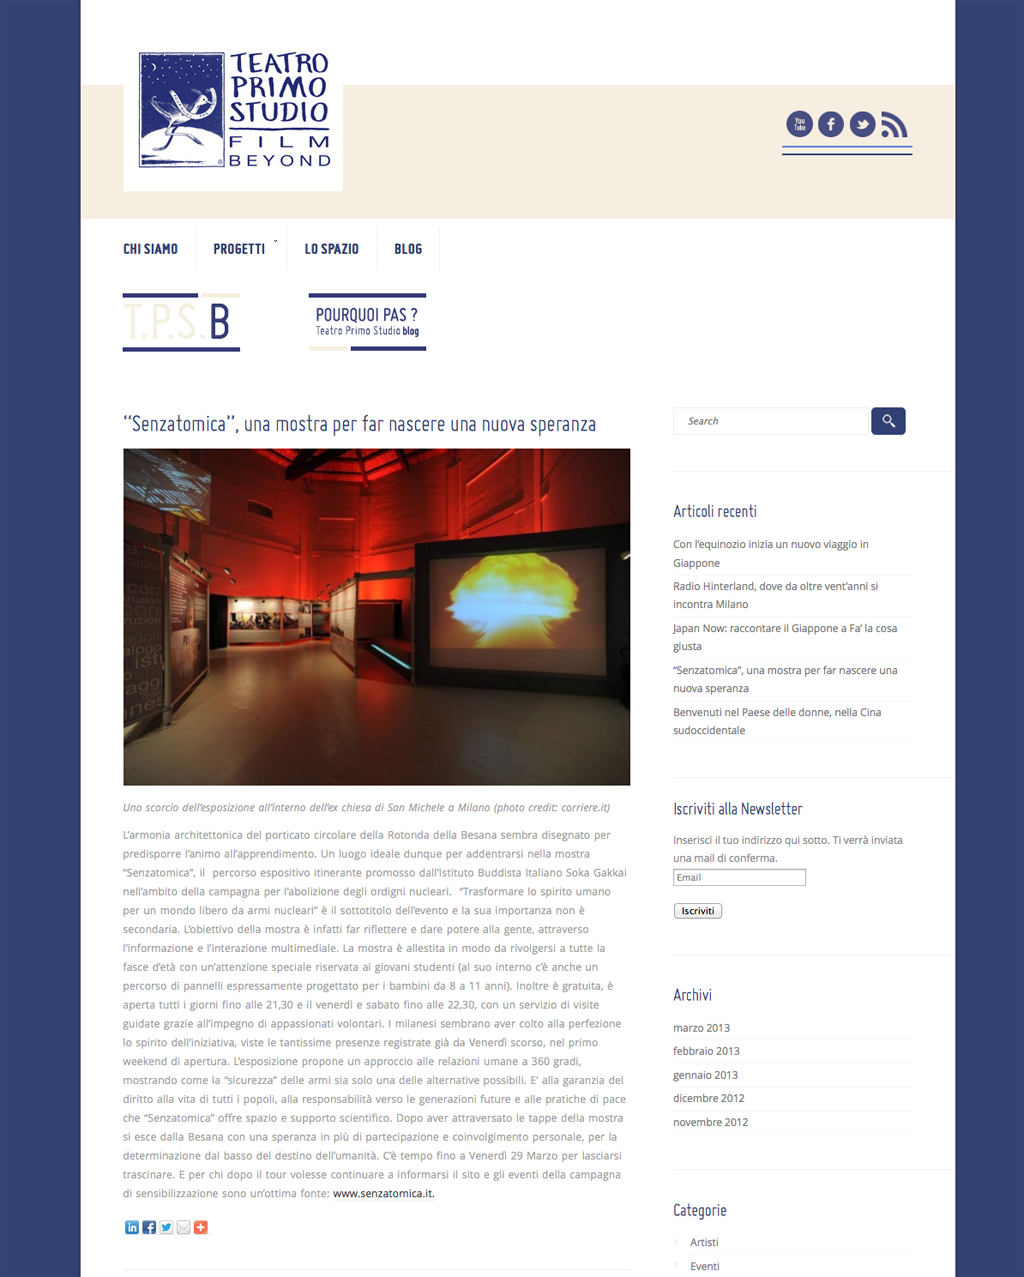 2013-03-12 Teatro Primo Studio